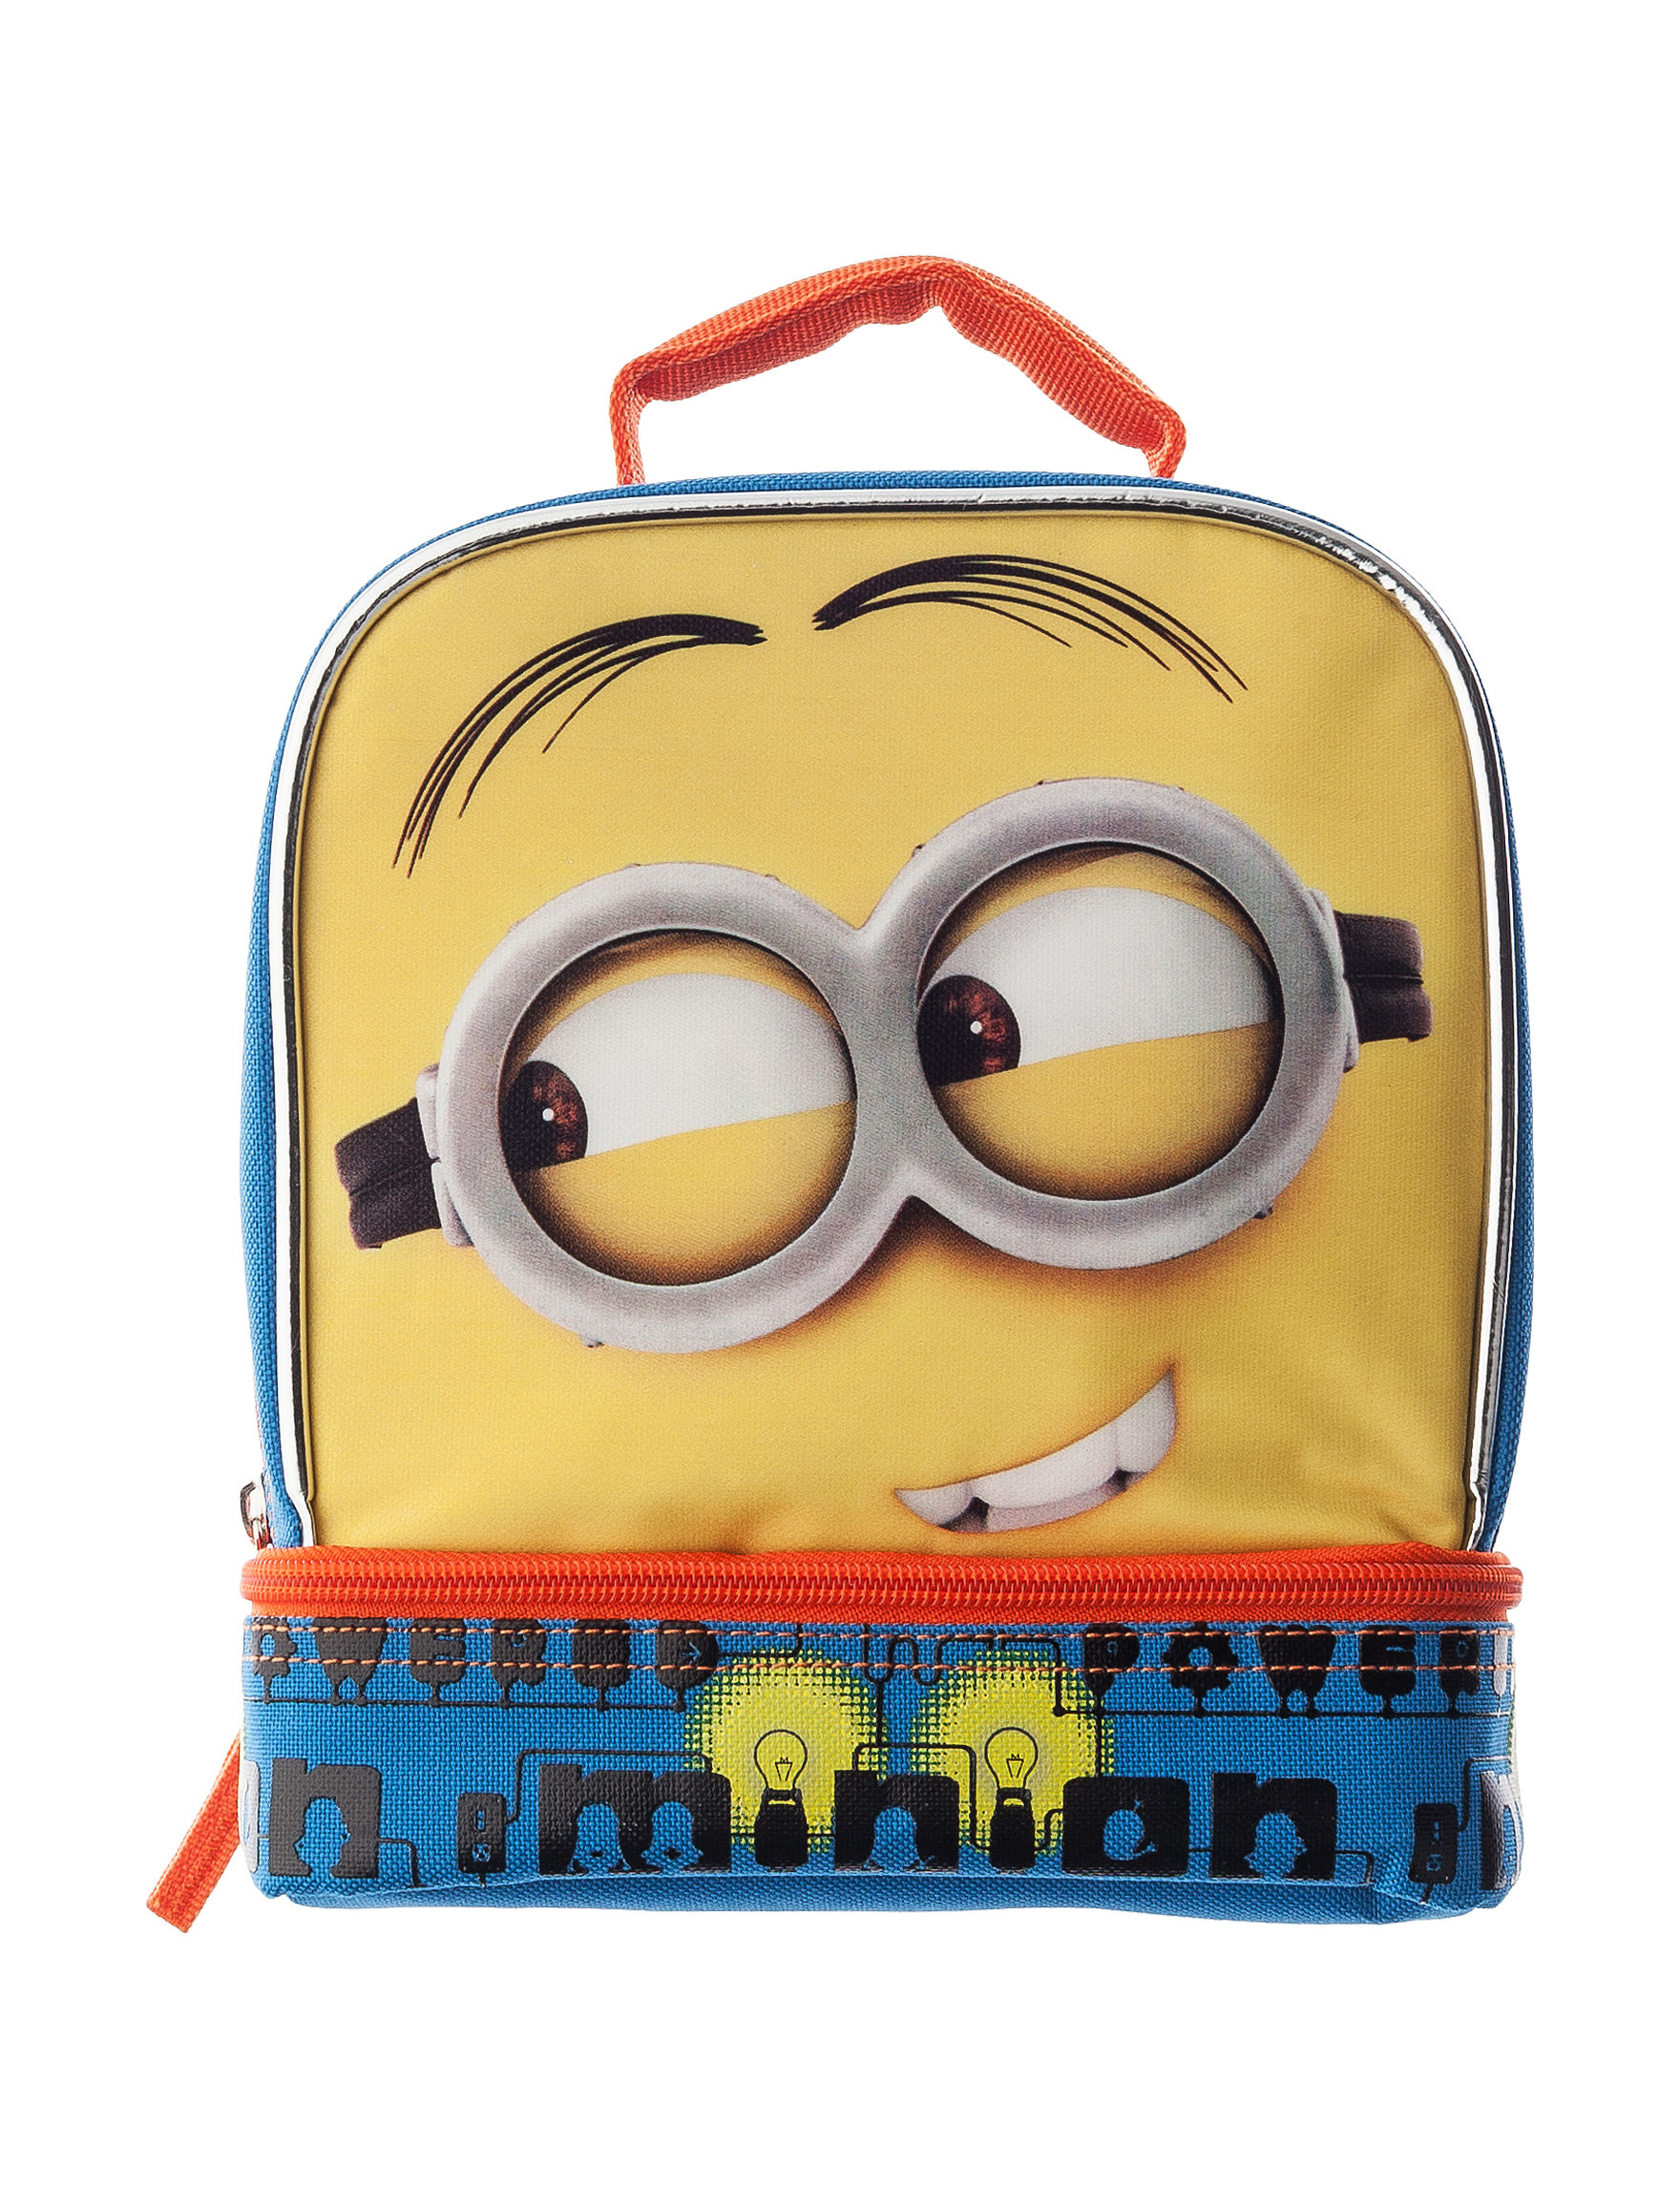 Licensed Blue Lunch Boxes & Bags Kitchen Storage & Organization